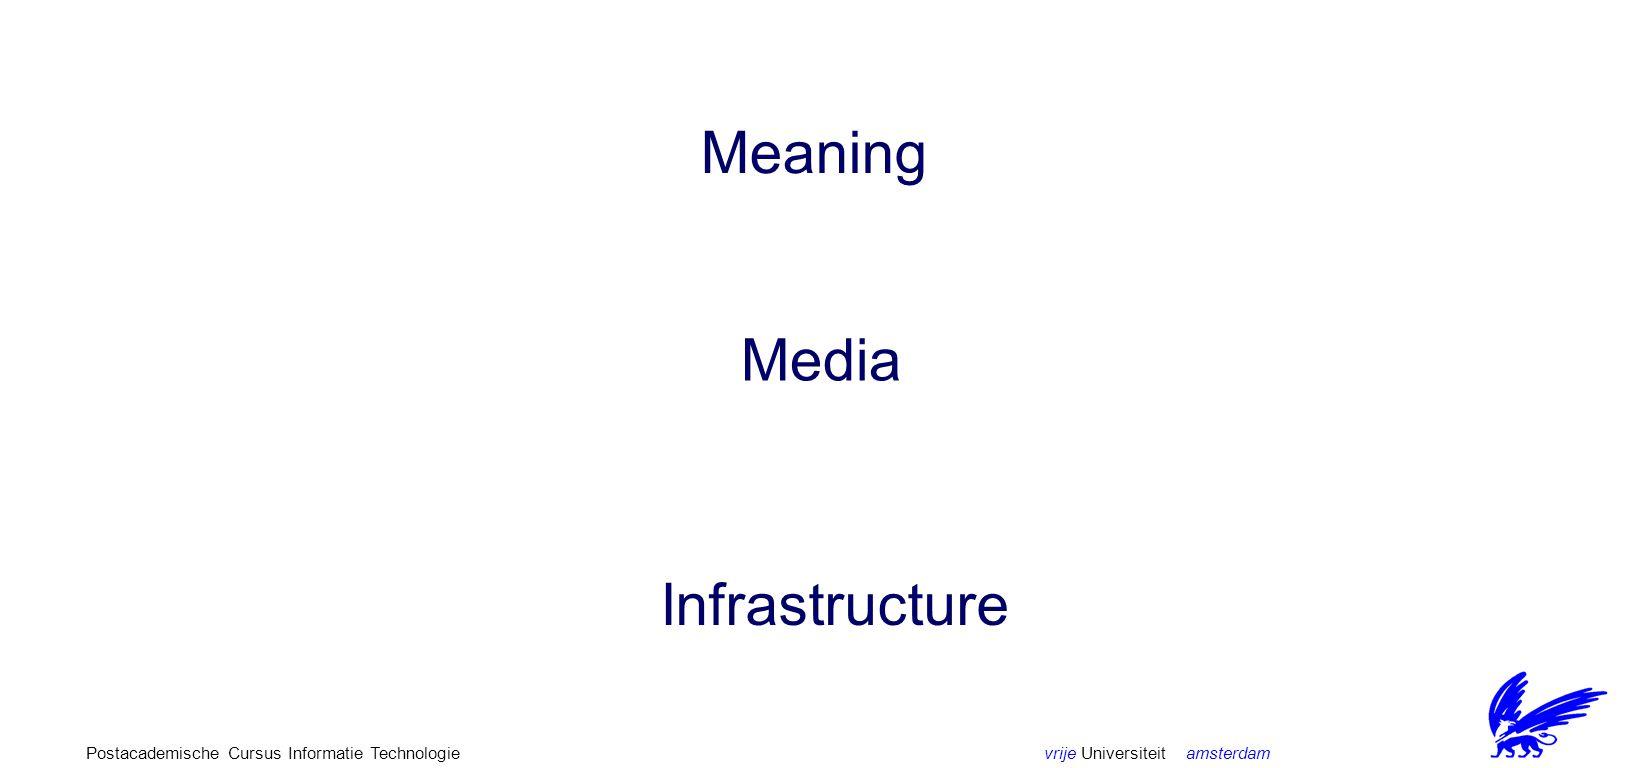 vrije Universiteit amsterdamPostacademische Cursus Informatie Technologie Designing a Web site does not solve a problem.